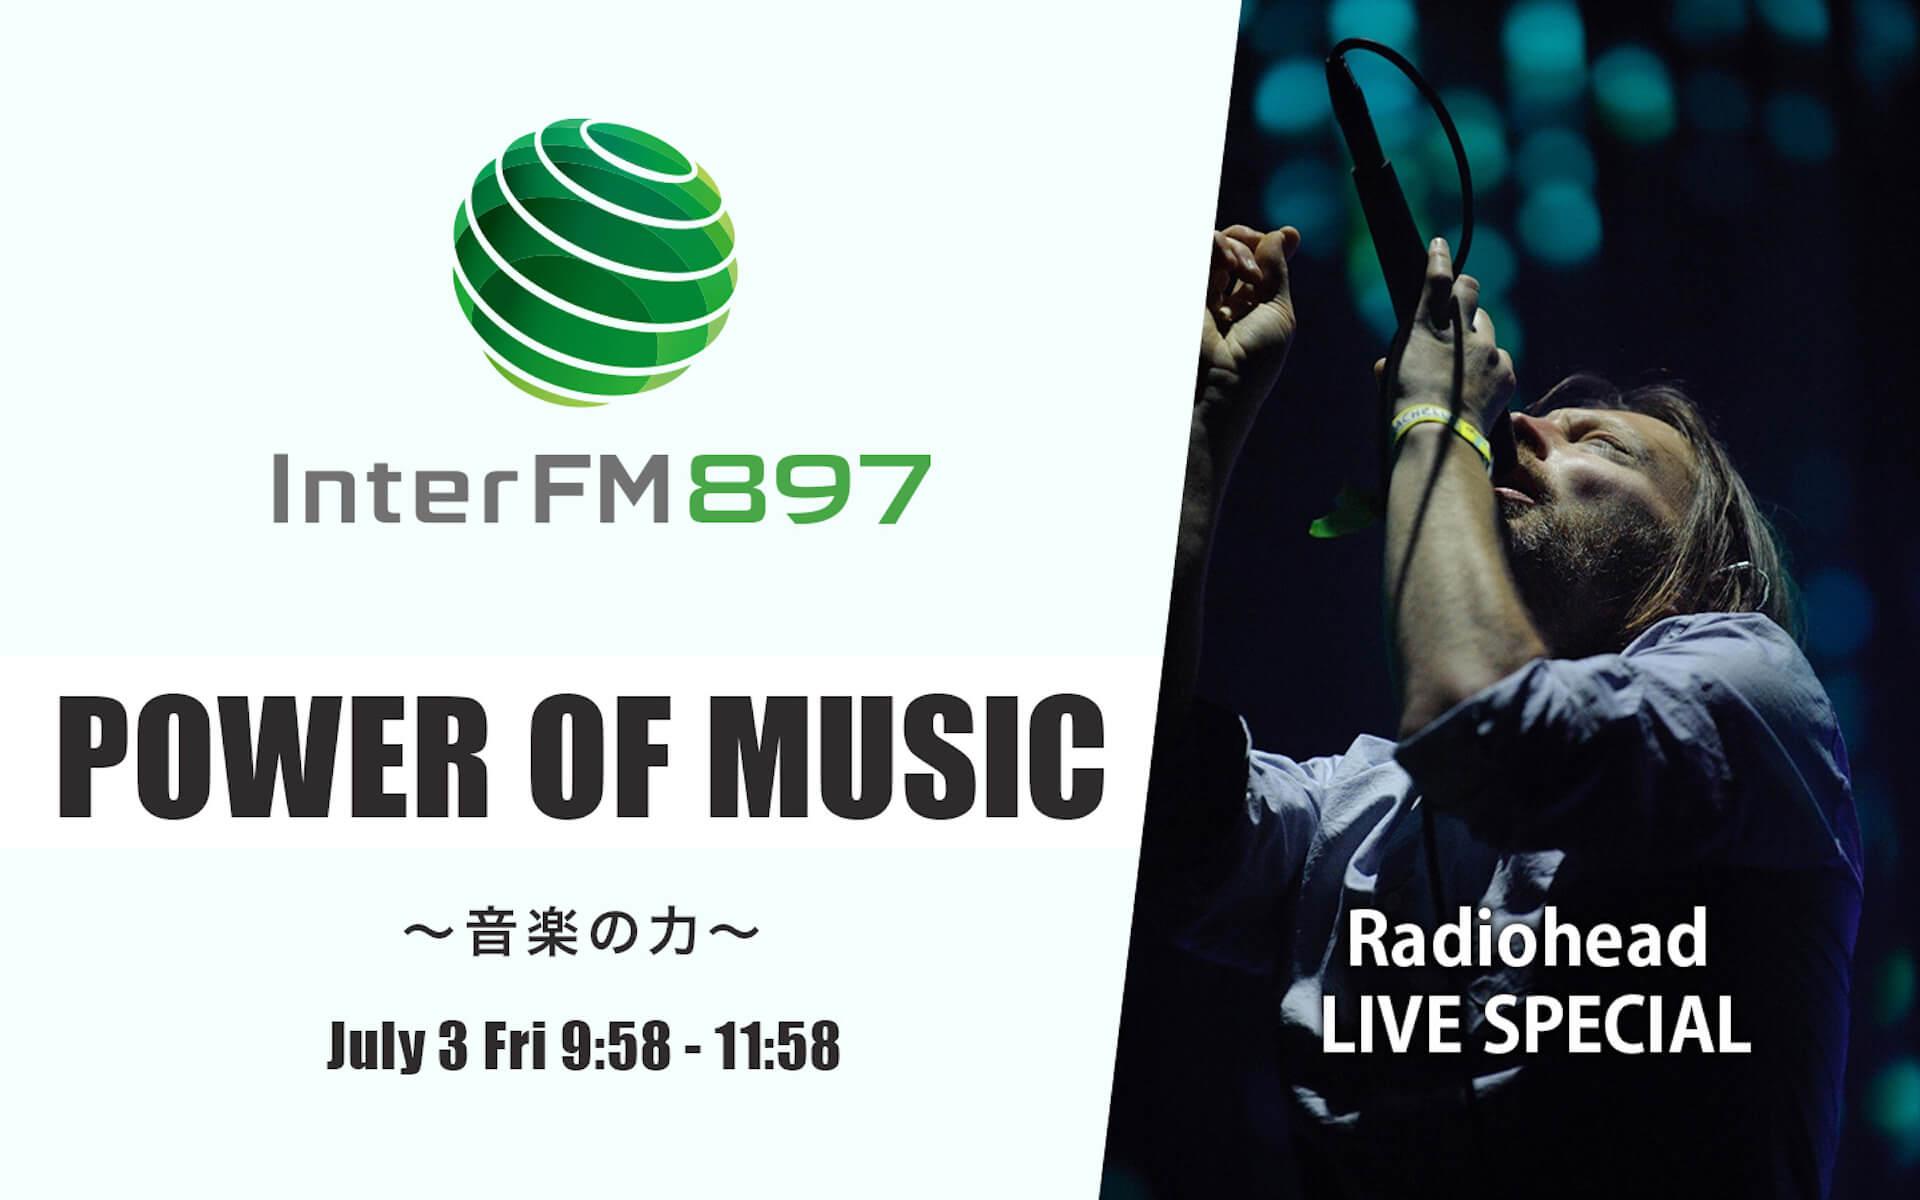 Radioheadの日本未公開ライブ音源がInterFM897で独占オンエア決定!特別番組が放送決定 music200701_interfm_radiohead_main